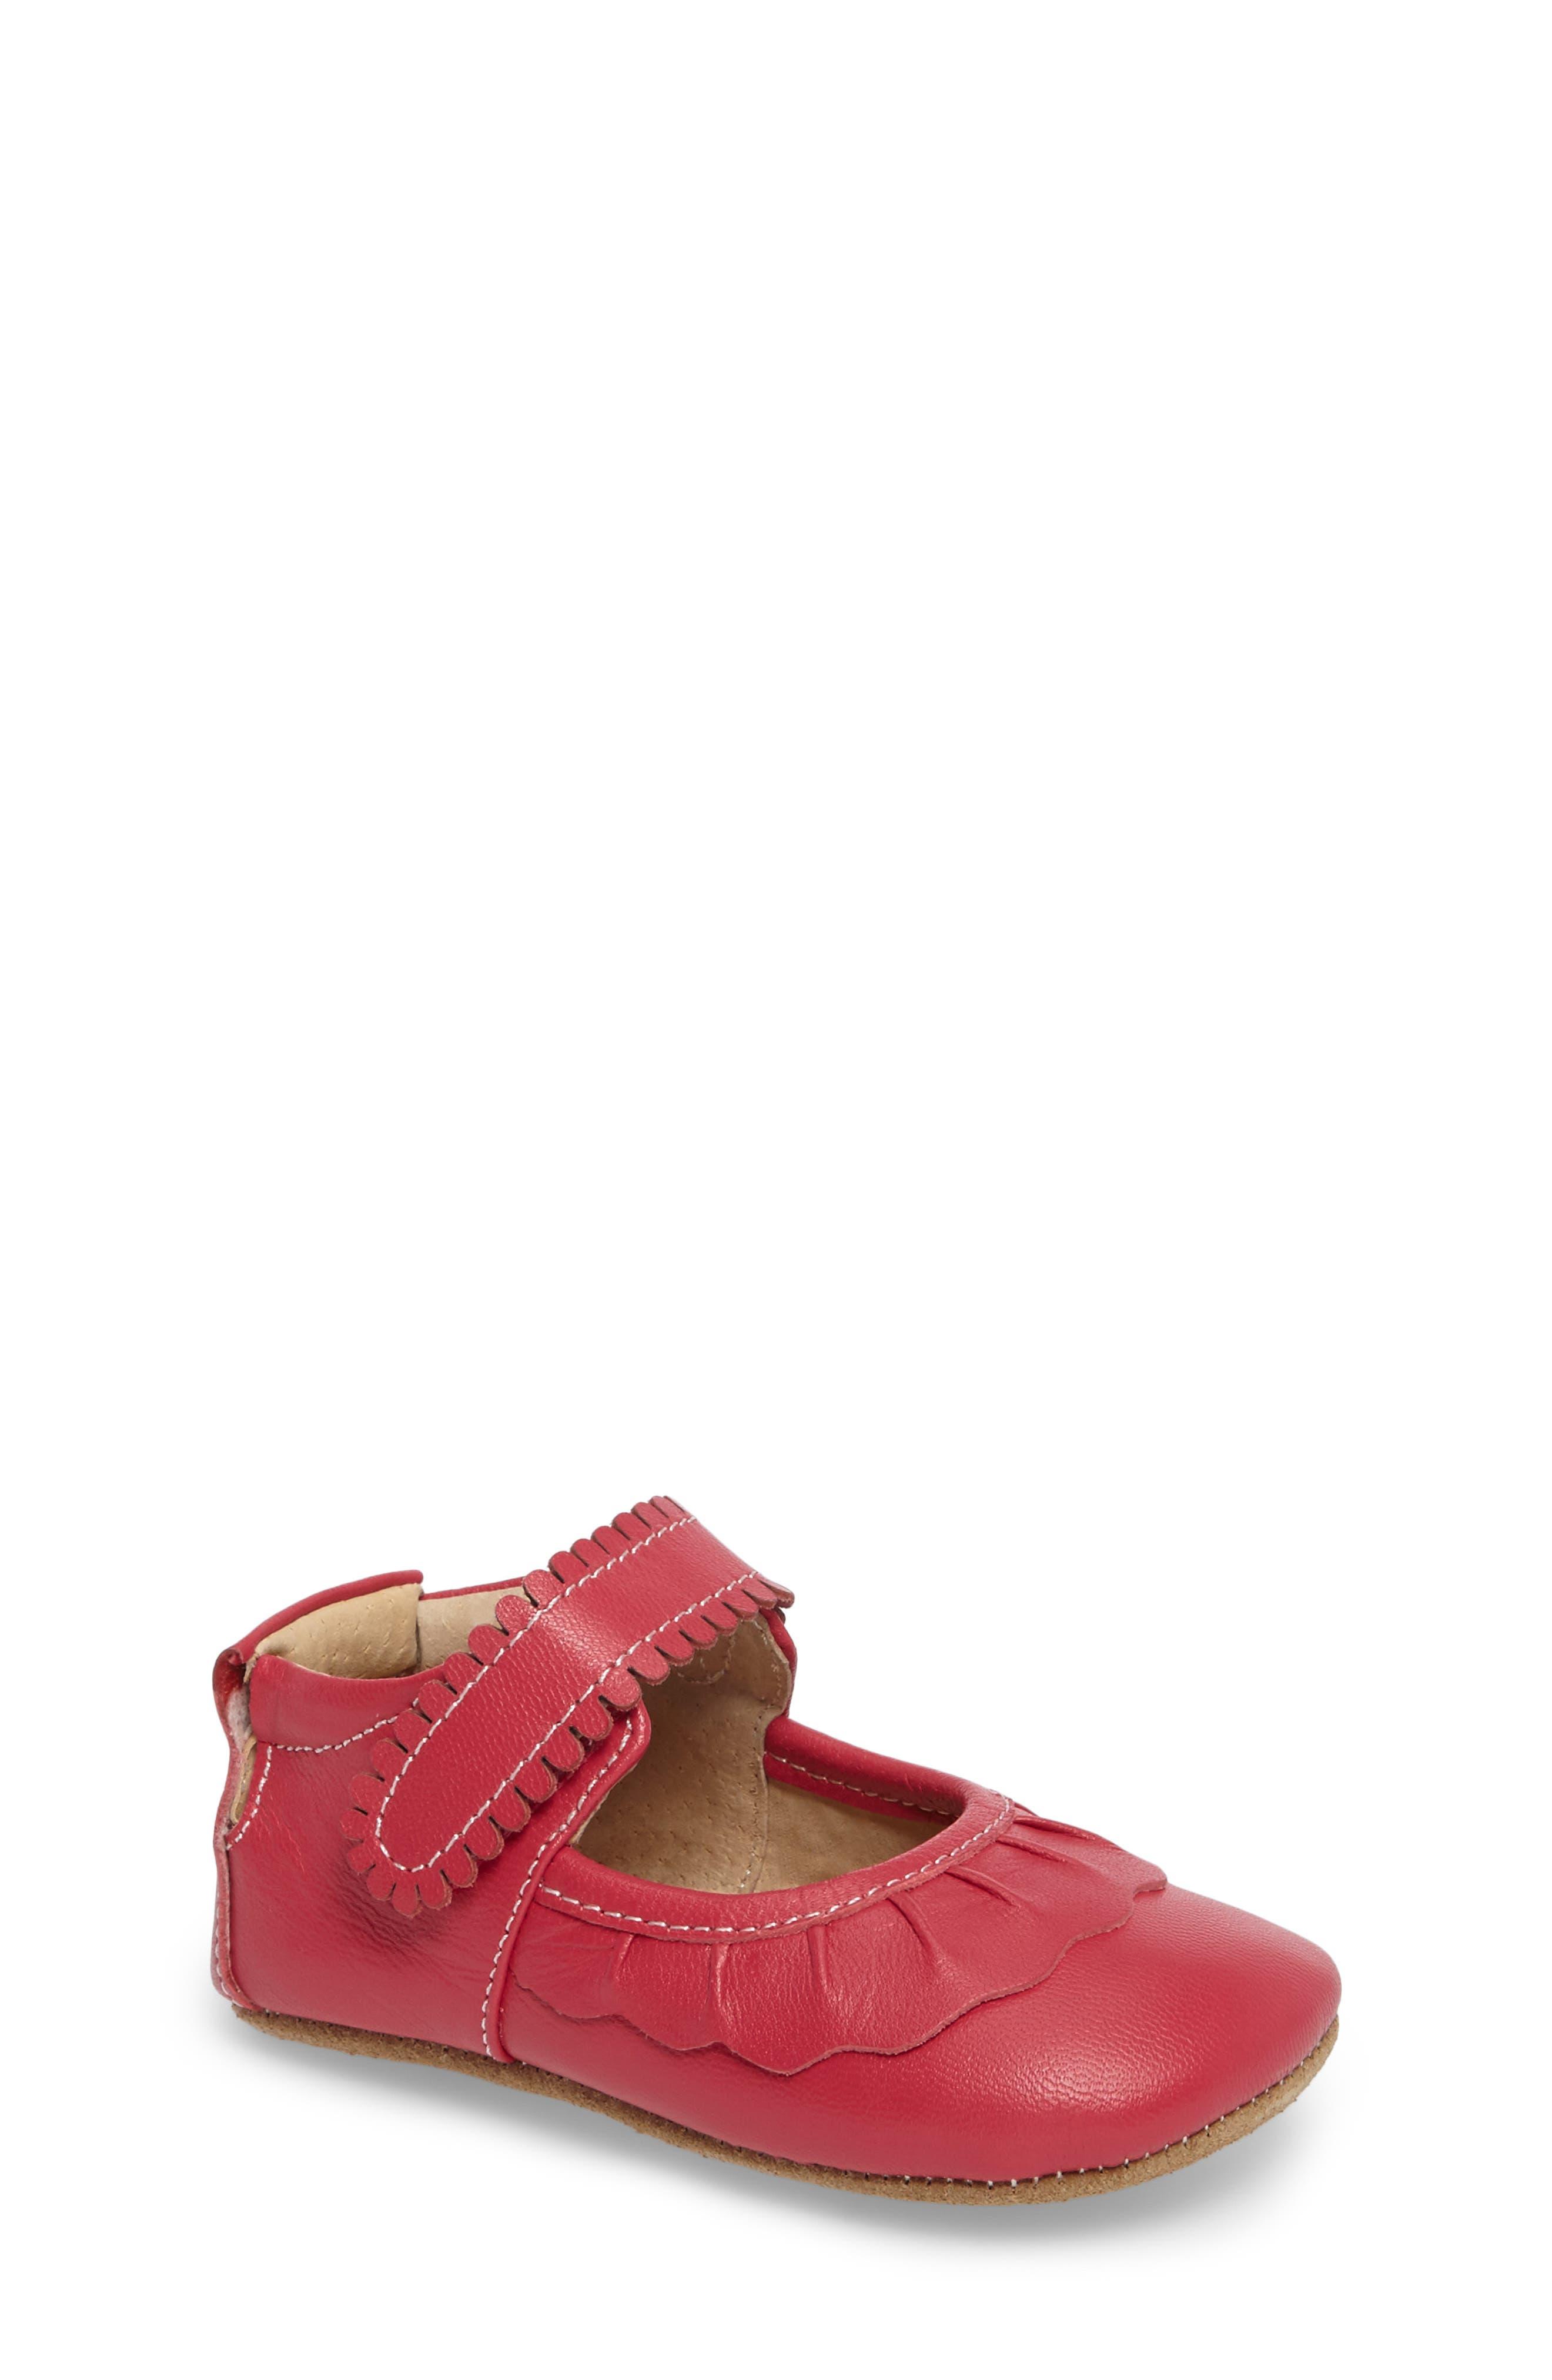 Livie & Luca 'Ruche' Mary Jane Crib Shoe (Baby & Walker)